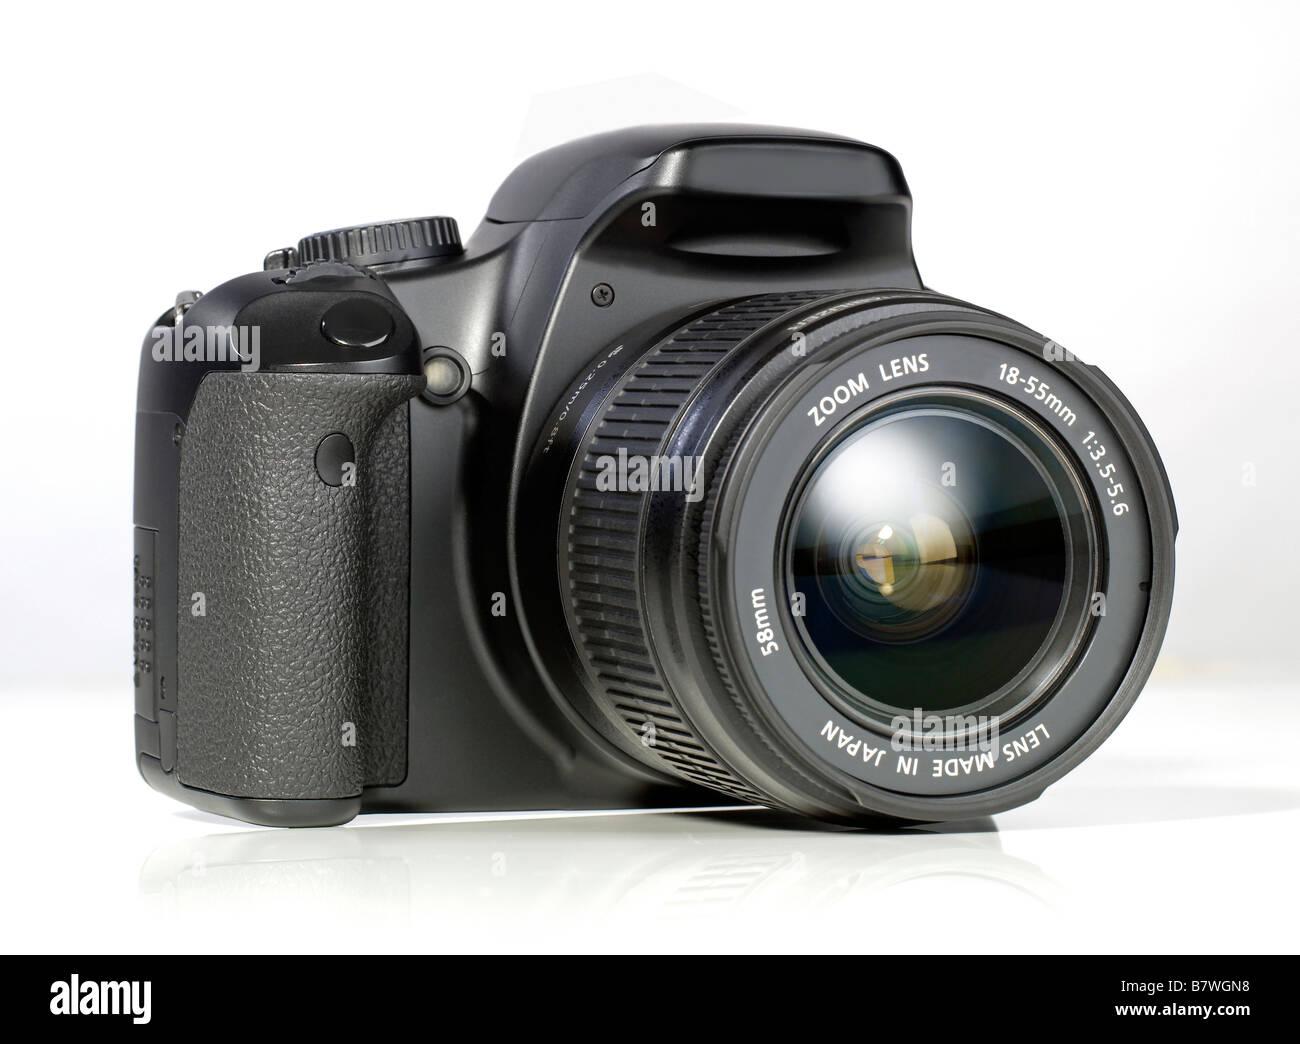 Black digital DSLR camera single lens reflex - Stock Image